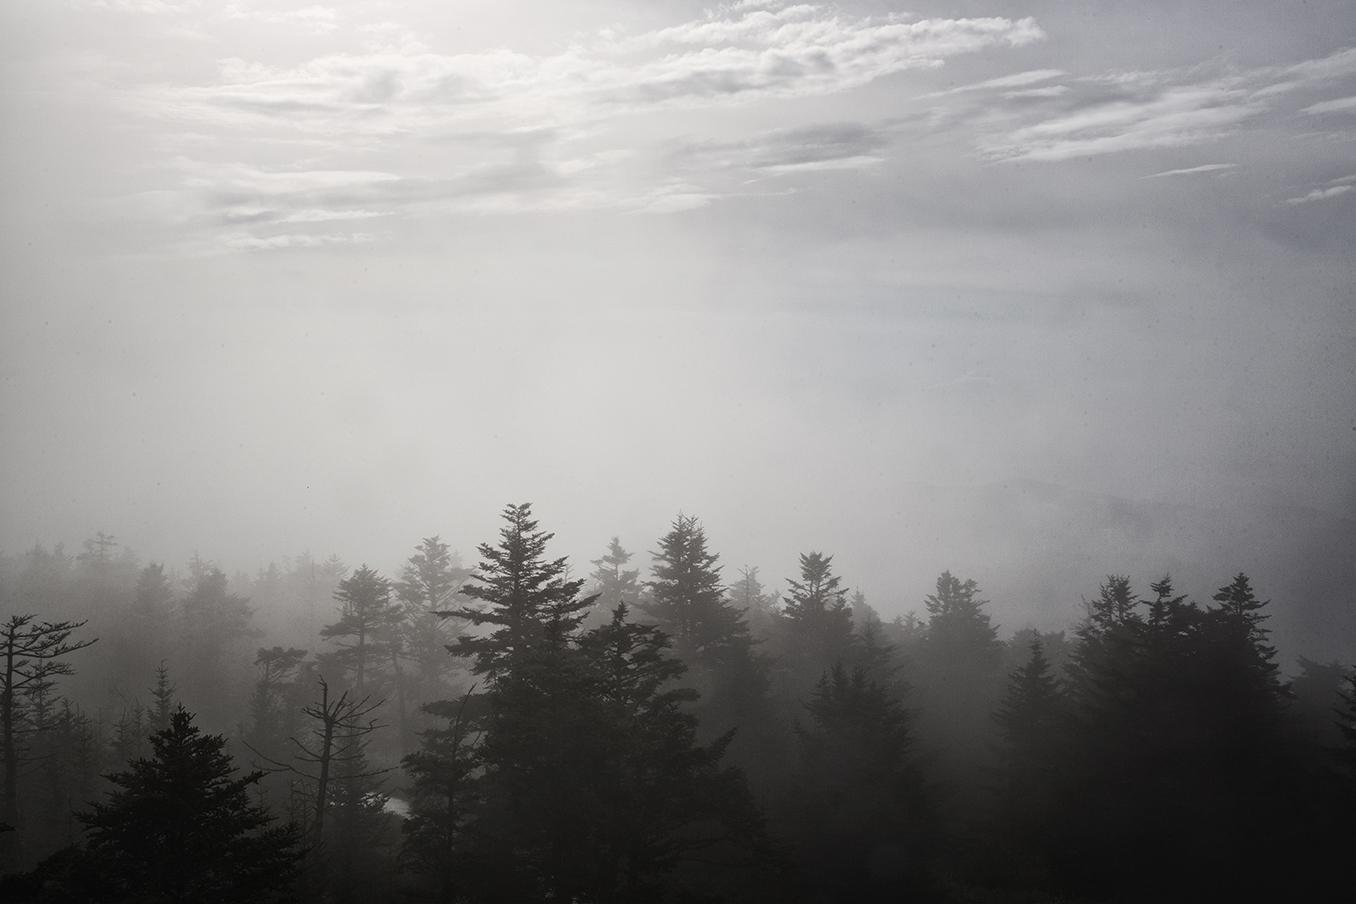 Tree_Mountain copy.jpg